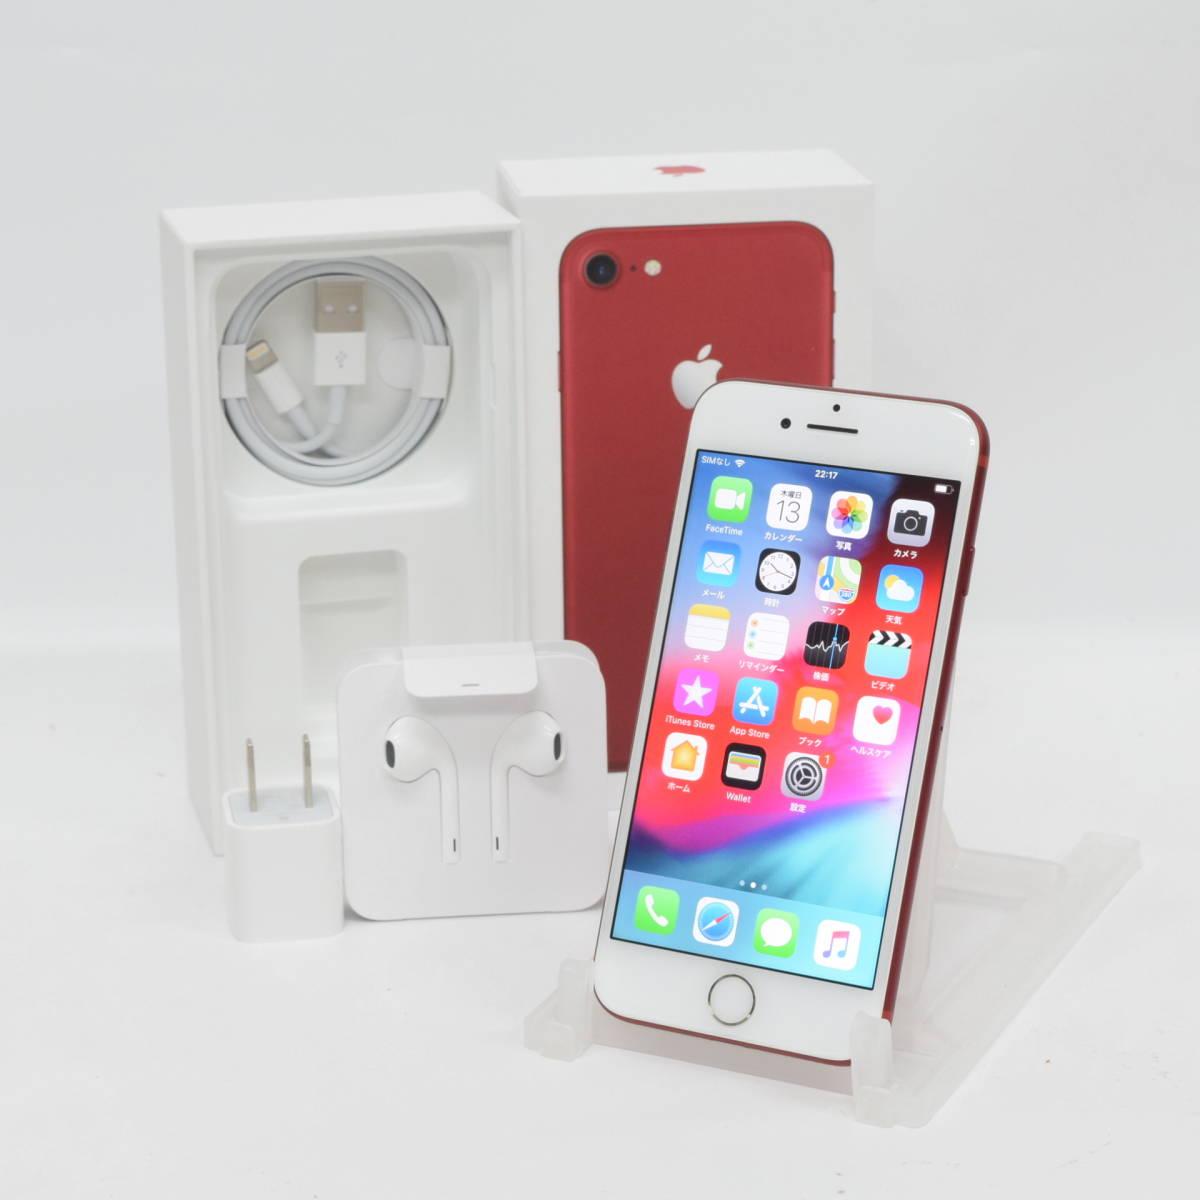 [TA503] 超美品 SIMフリー iPhone7 PRODUCT RED 128GB 付属品未使用 MPRX2J/A A1779 プロダクト レッド